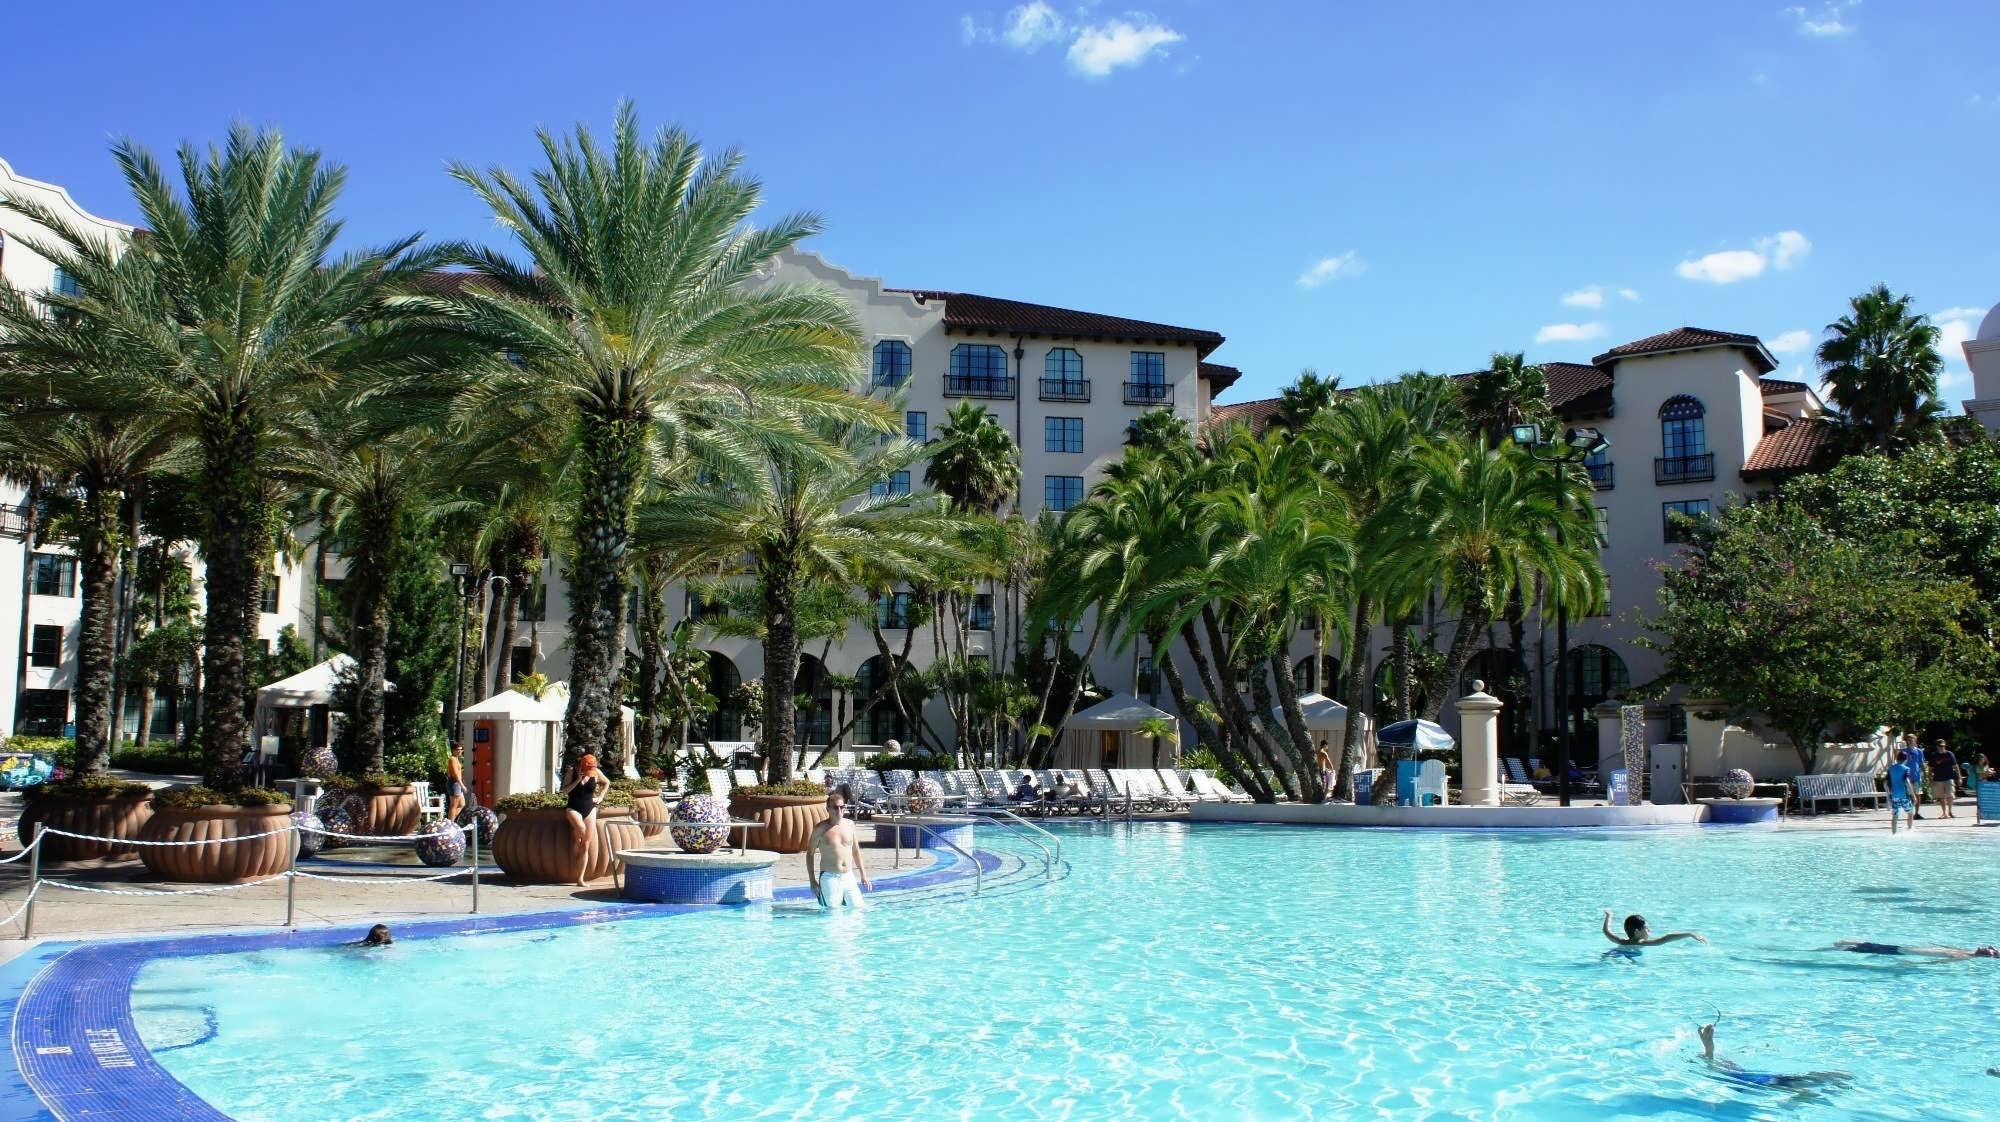 Beach Pool at Universal's Hard Rock Hotel